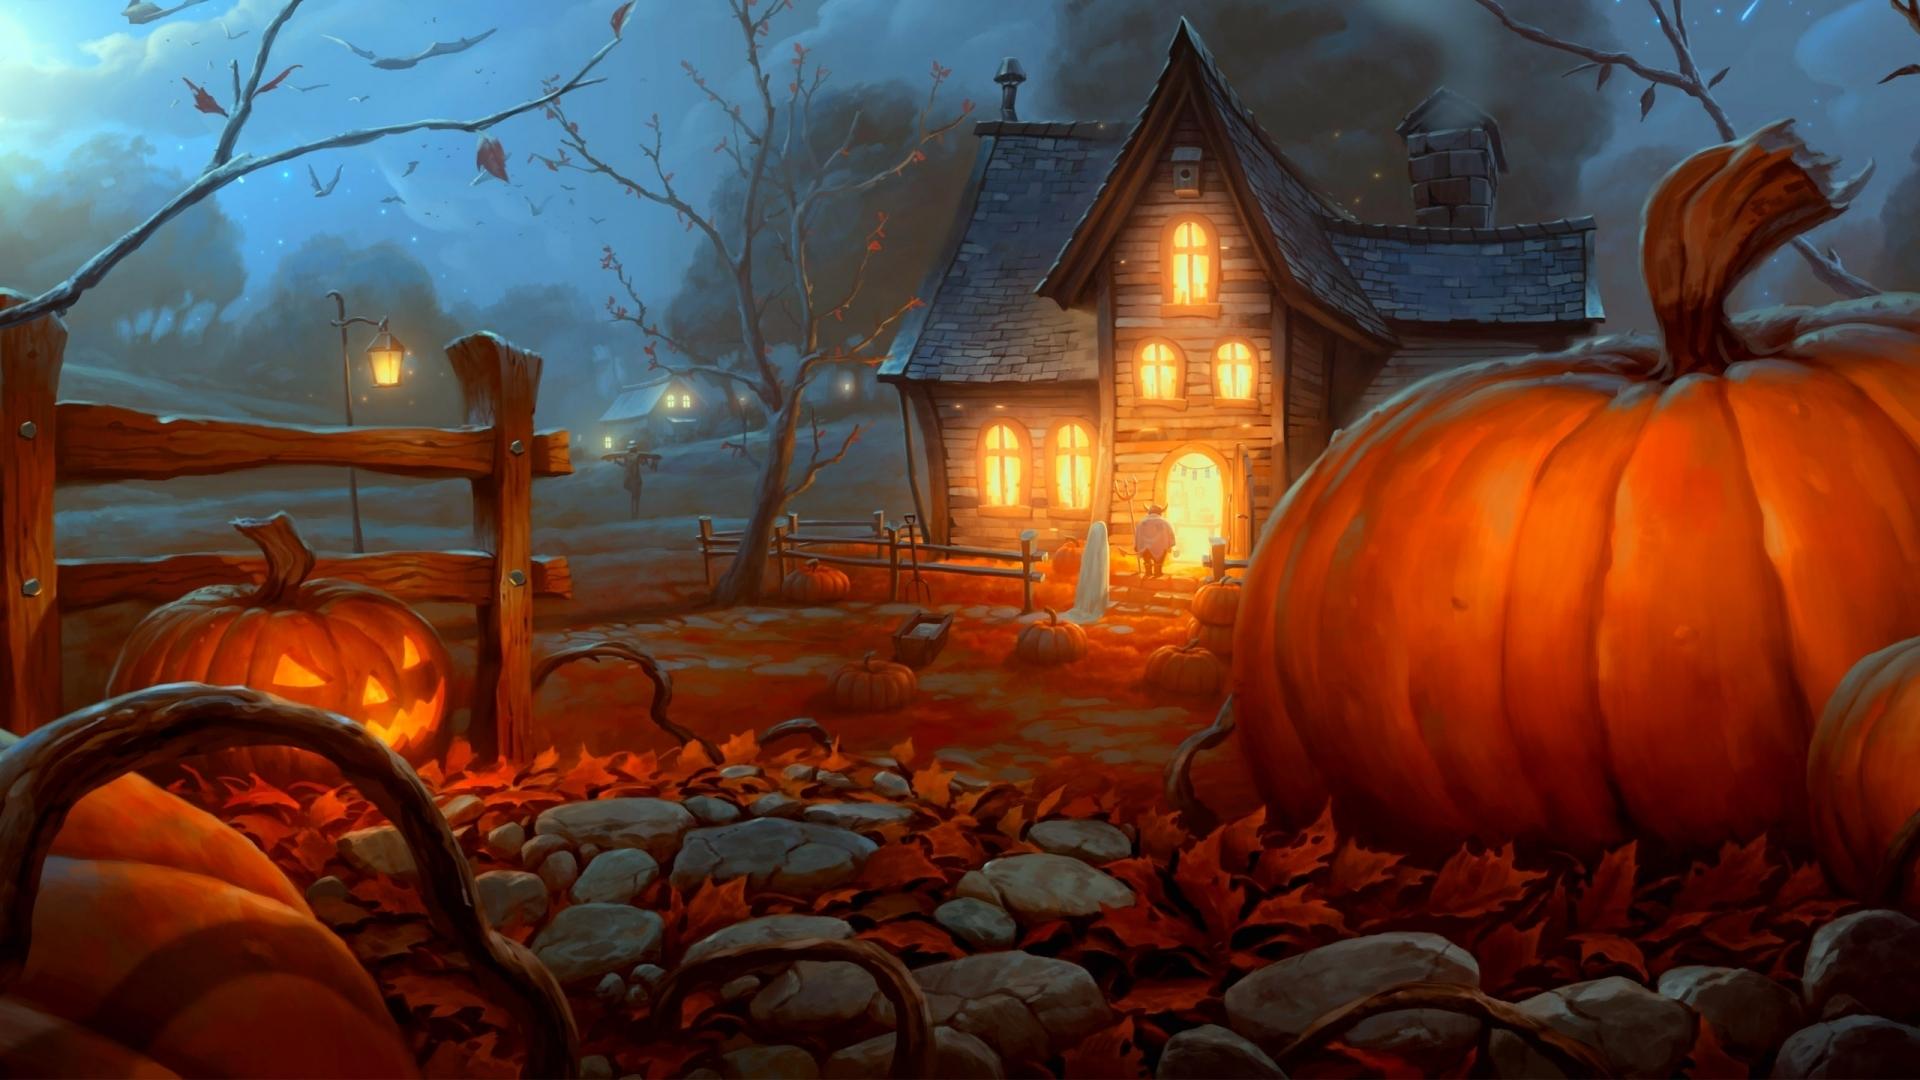 libre halloween wallpaper hd